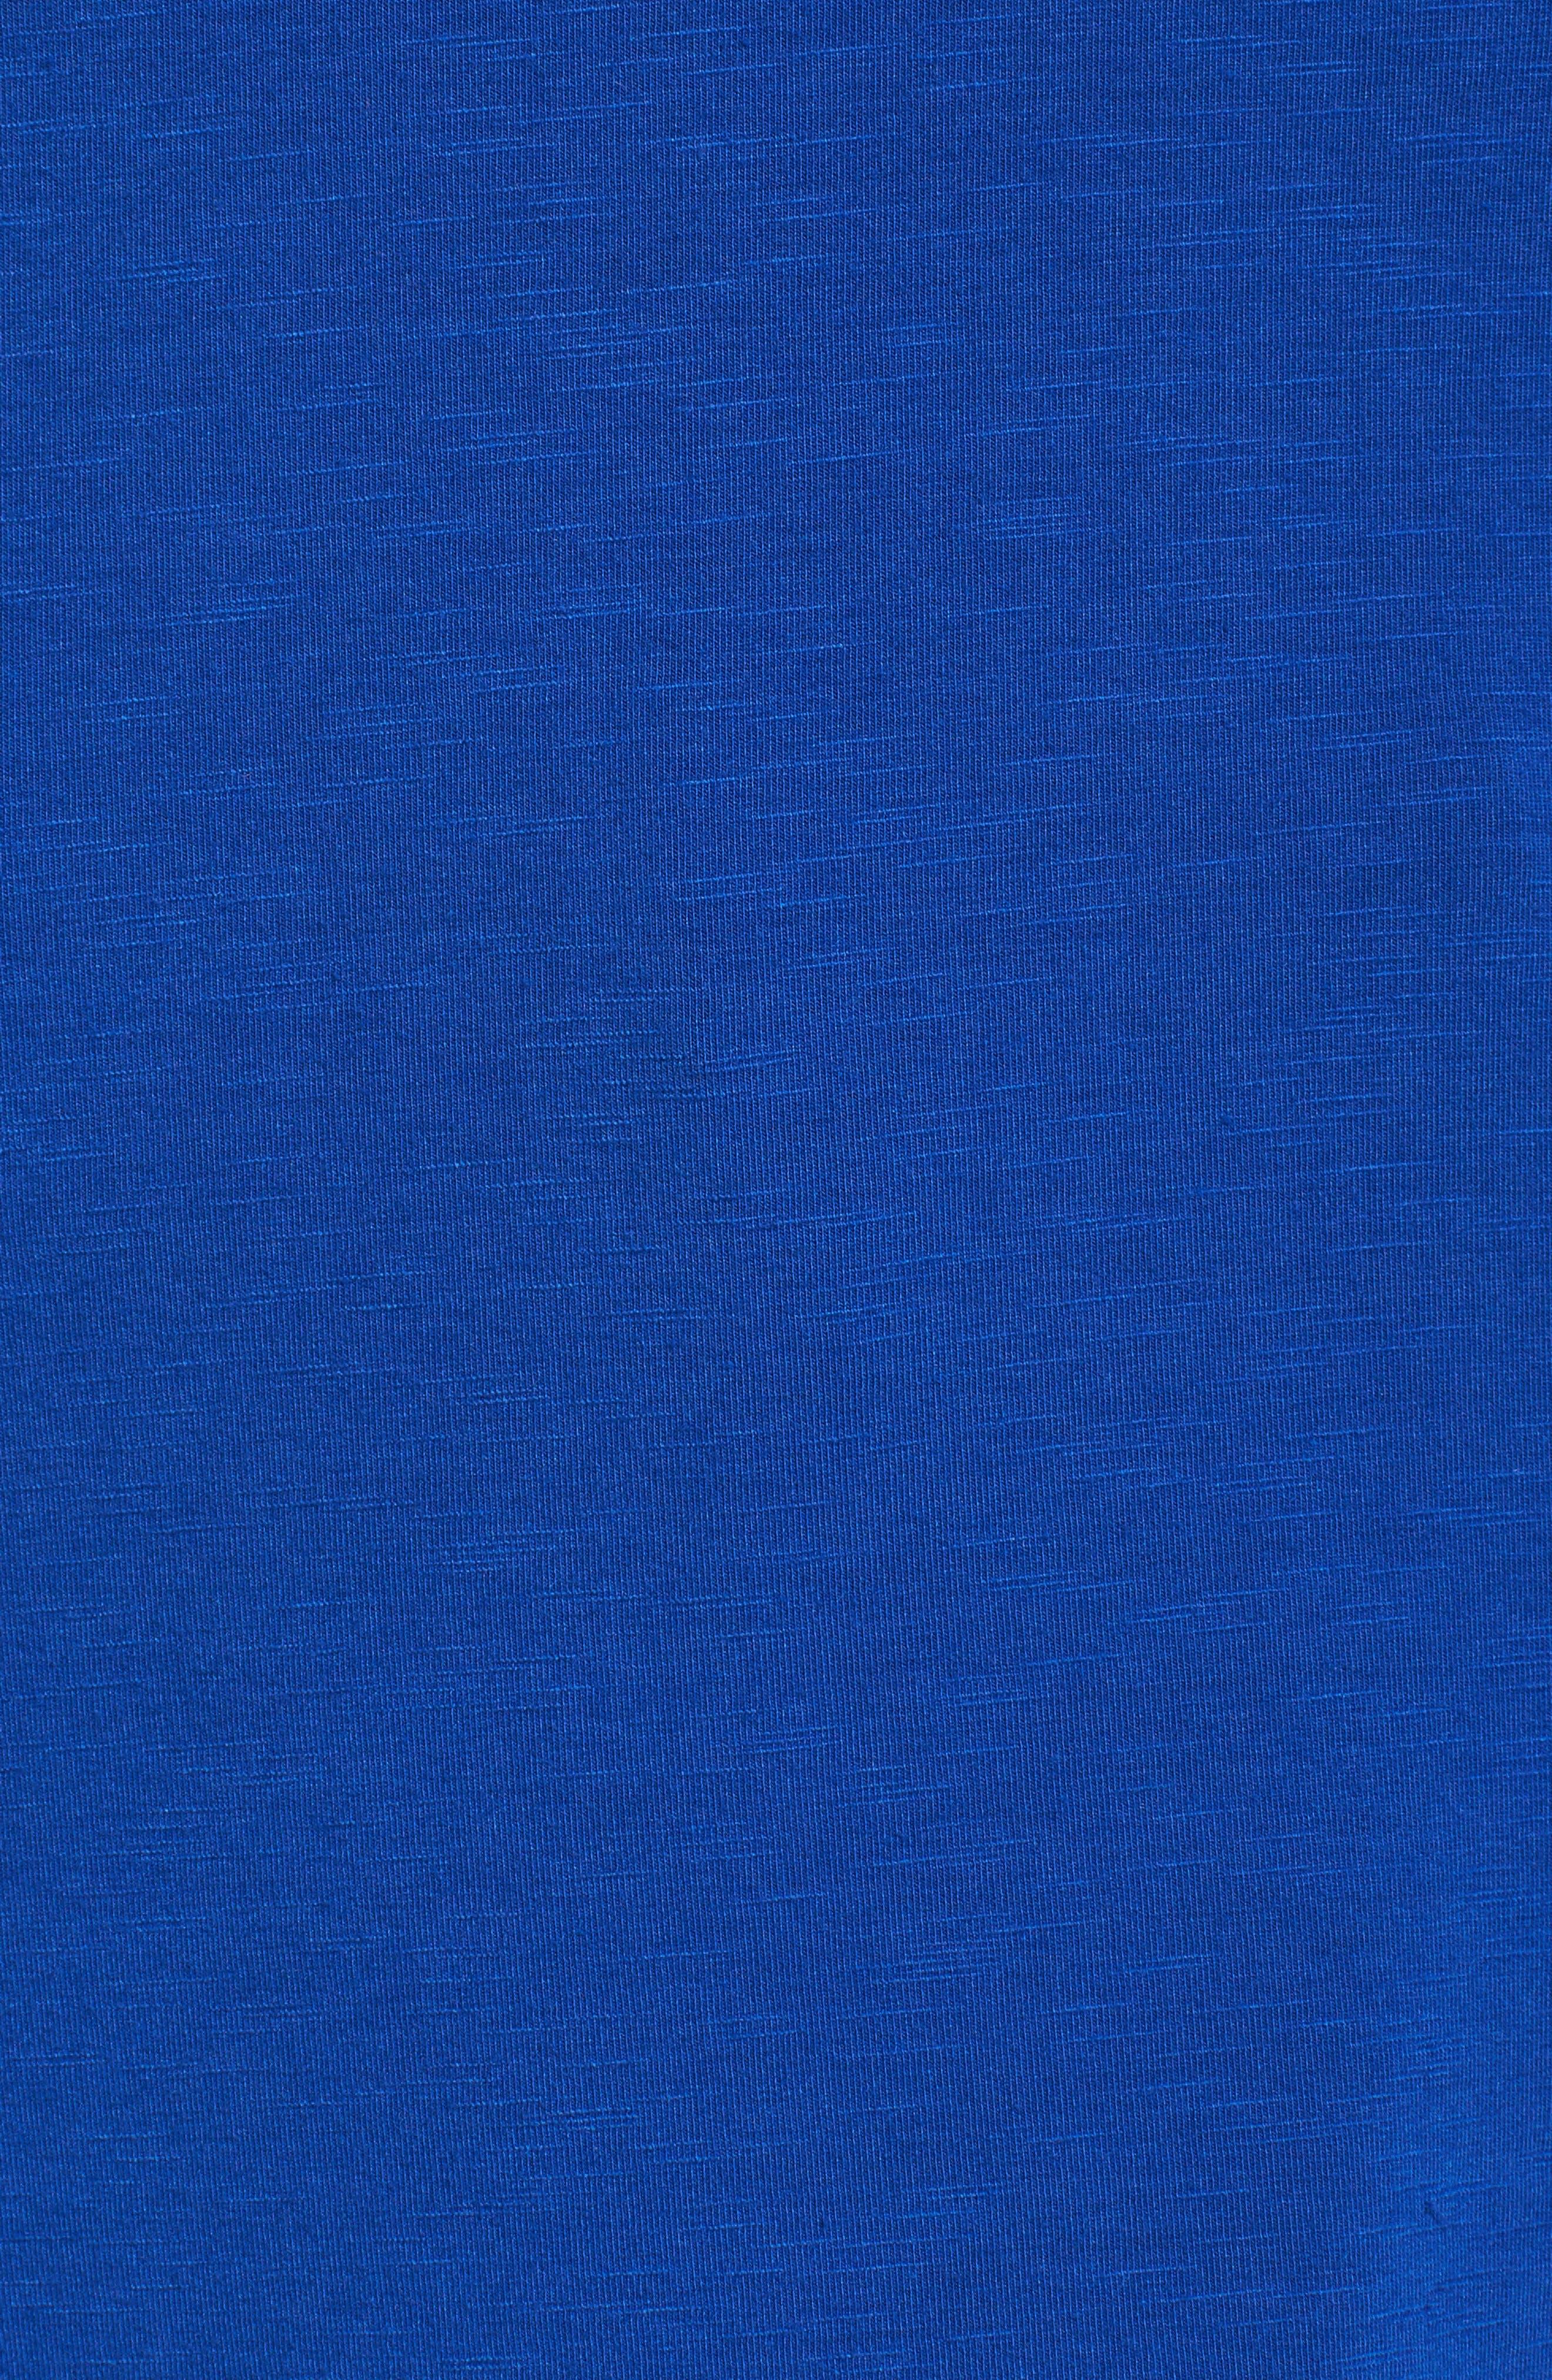 Alternate Image 5  - REBEL WILSON X ANGELS Lace-Up Slub Jersey Top (Plus Size)